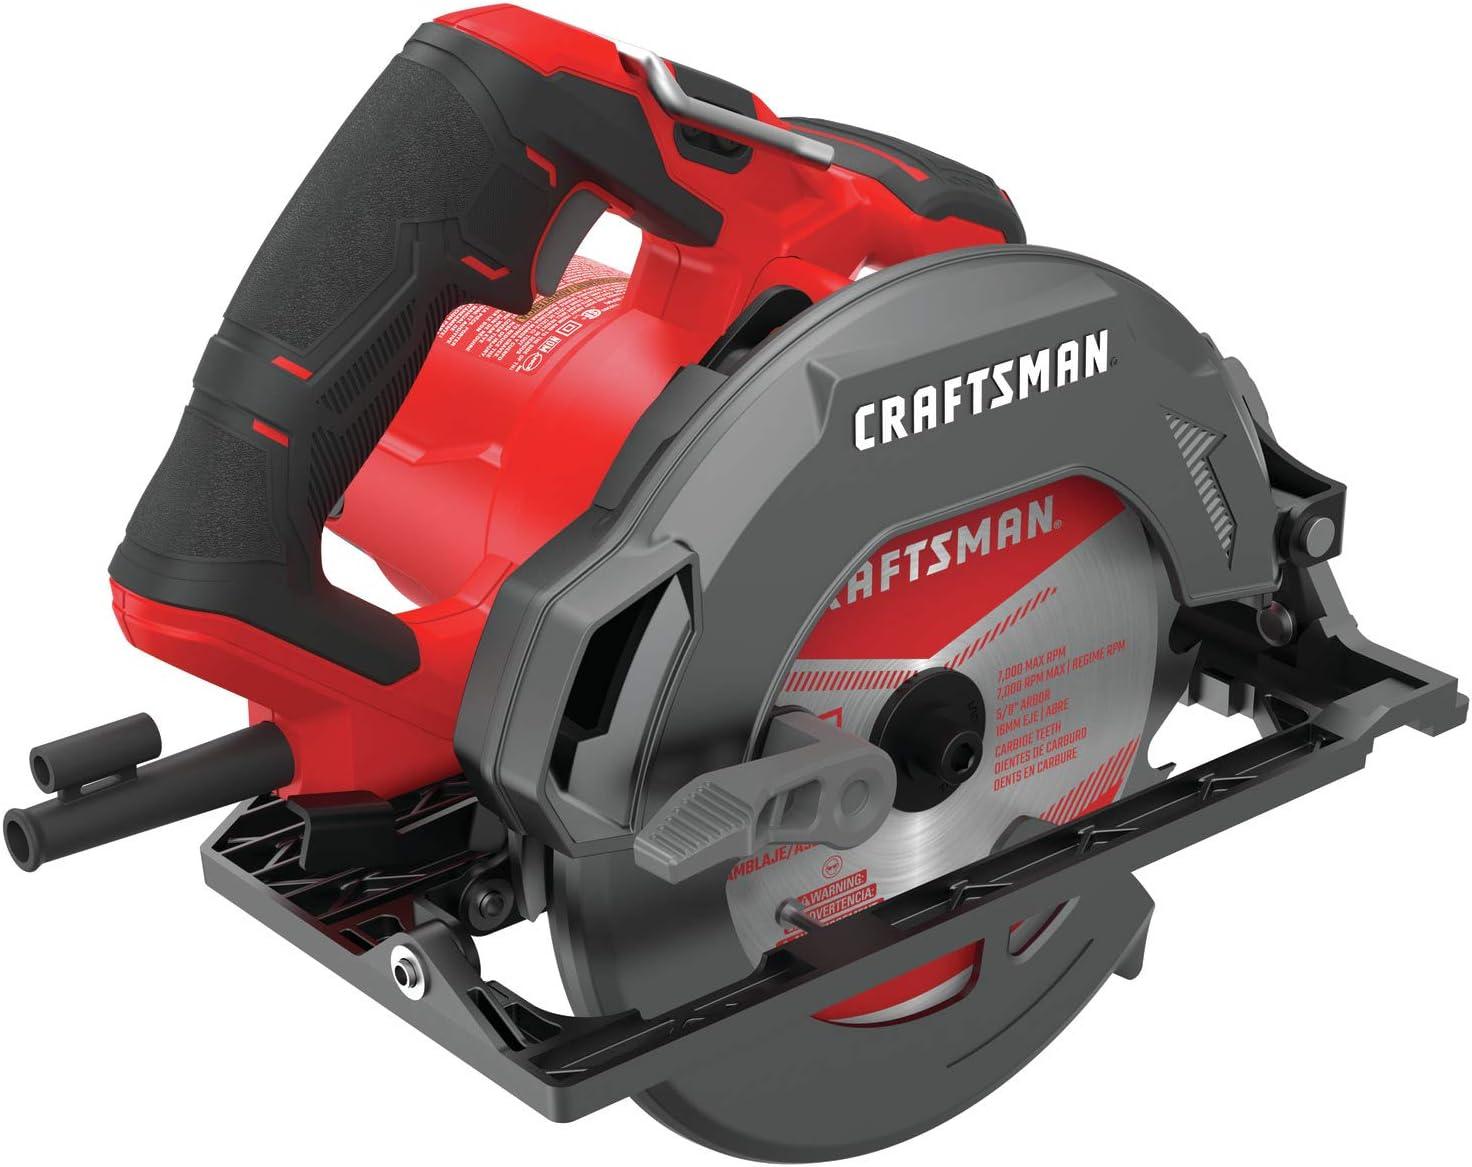 5. Craftsman CMES510 Circular Saw